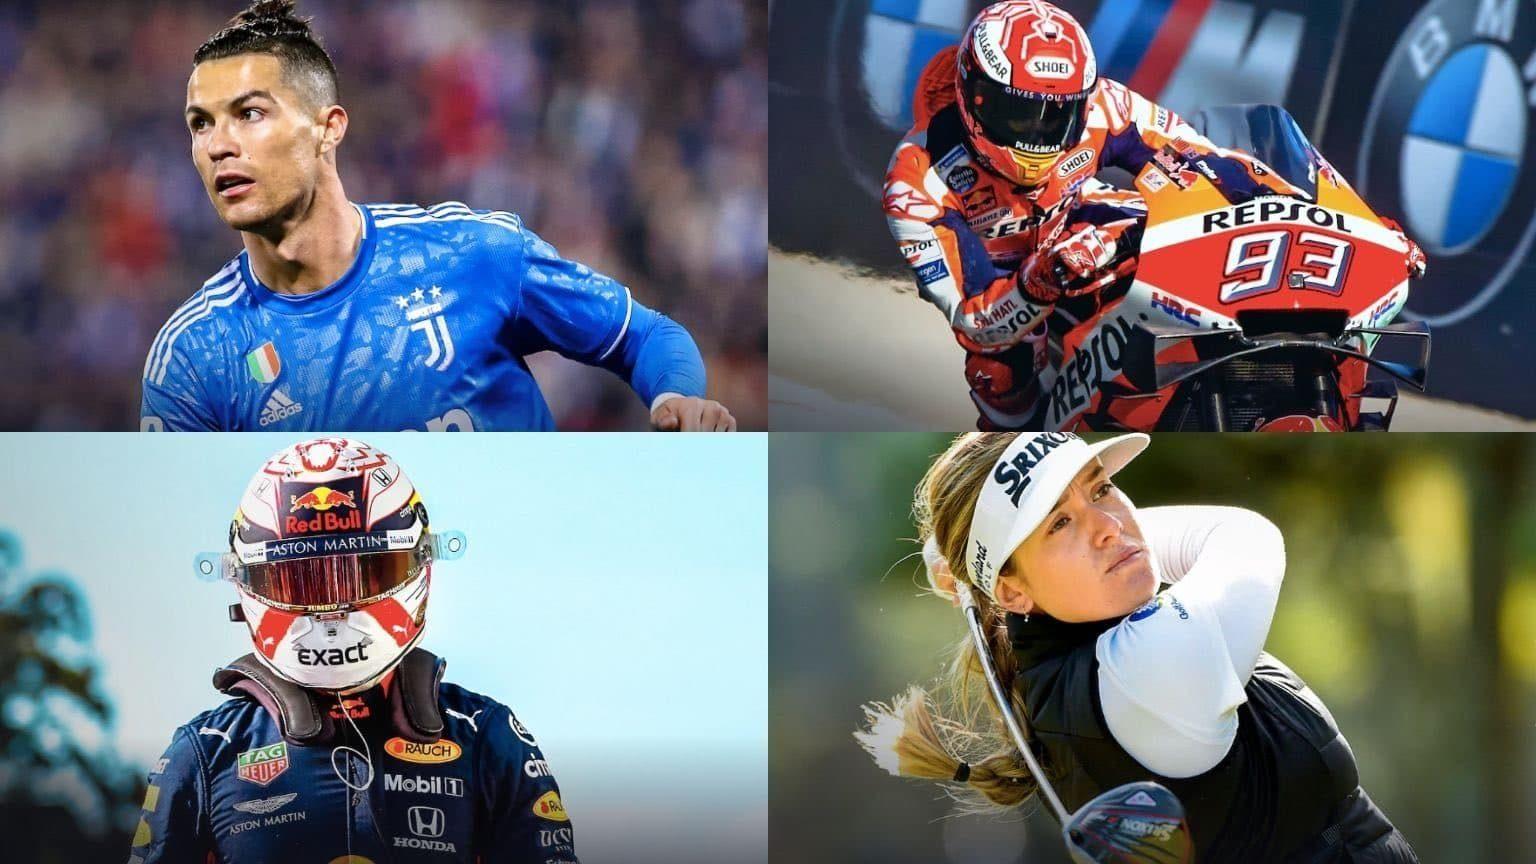 Cristiano Ronaldo, F1 Racer, MotoGP rider and female golfer